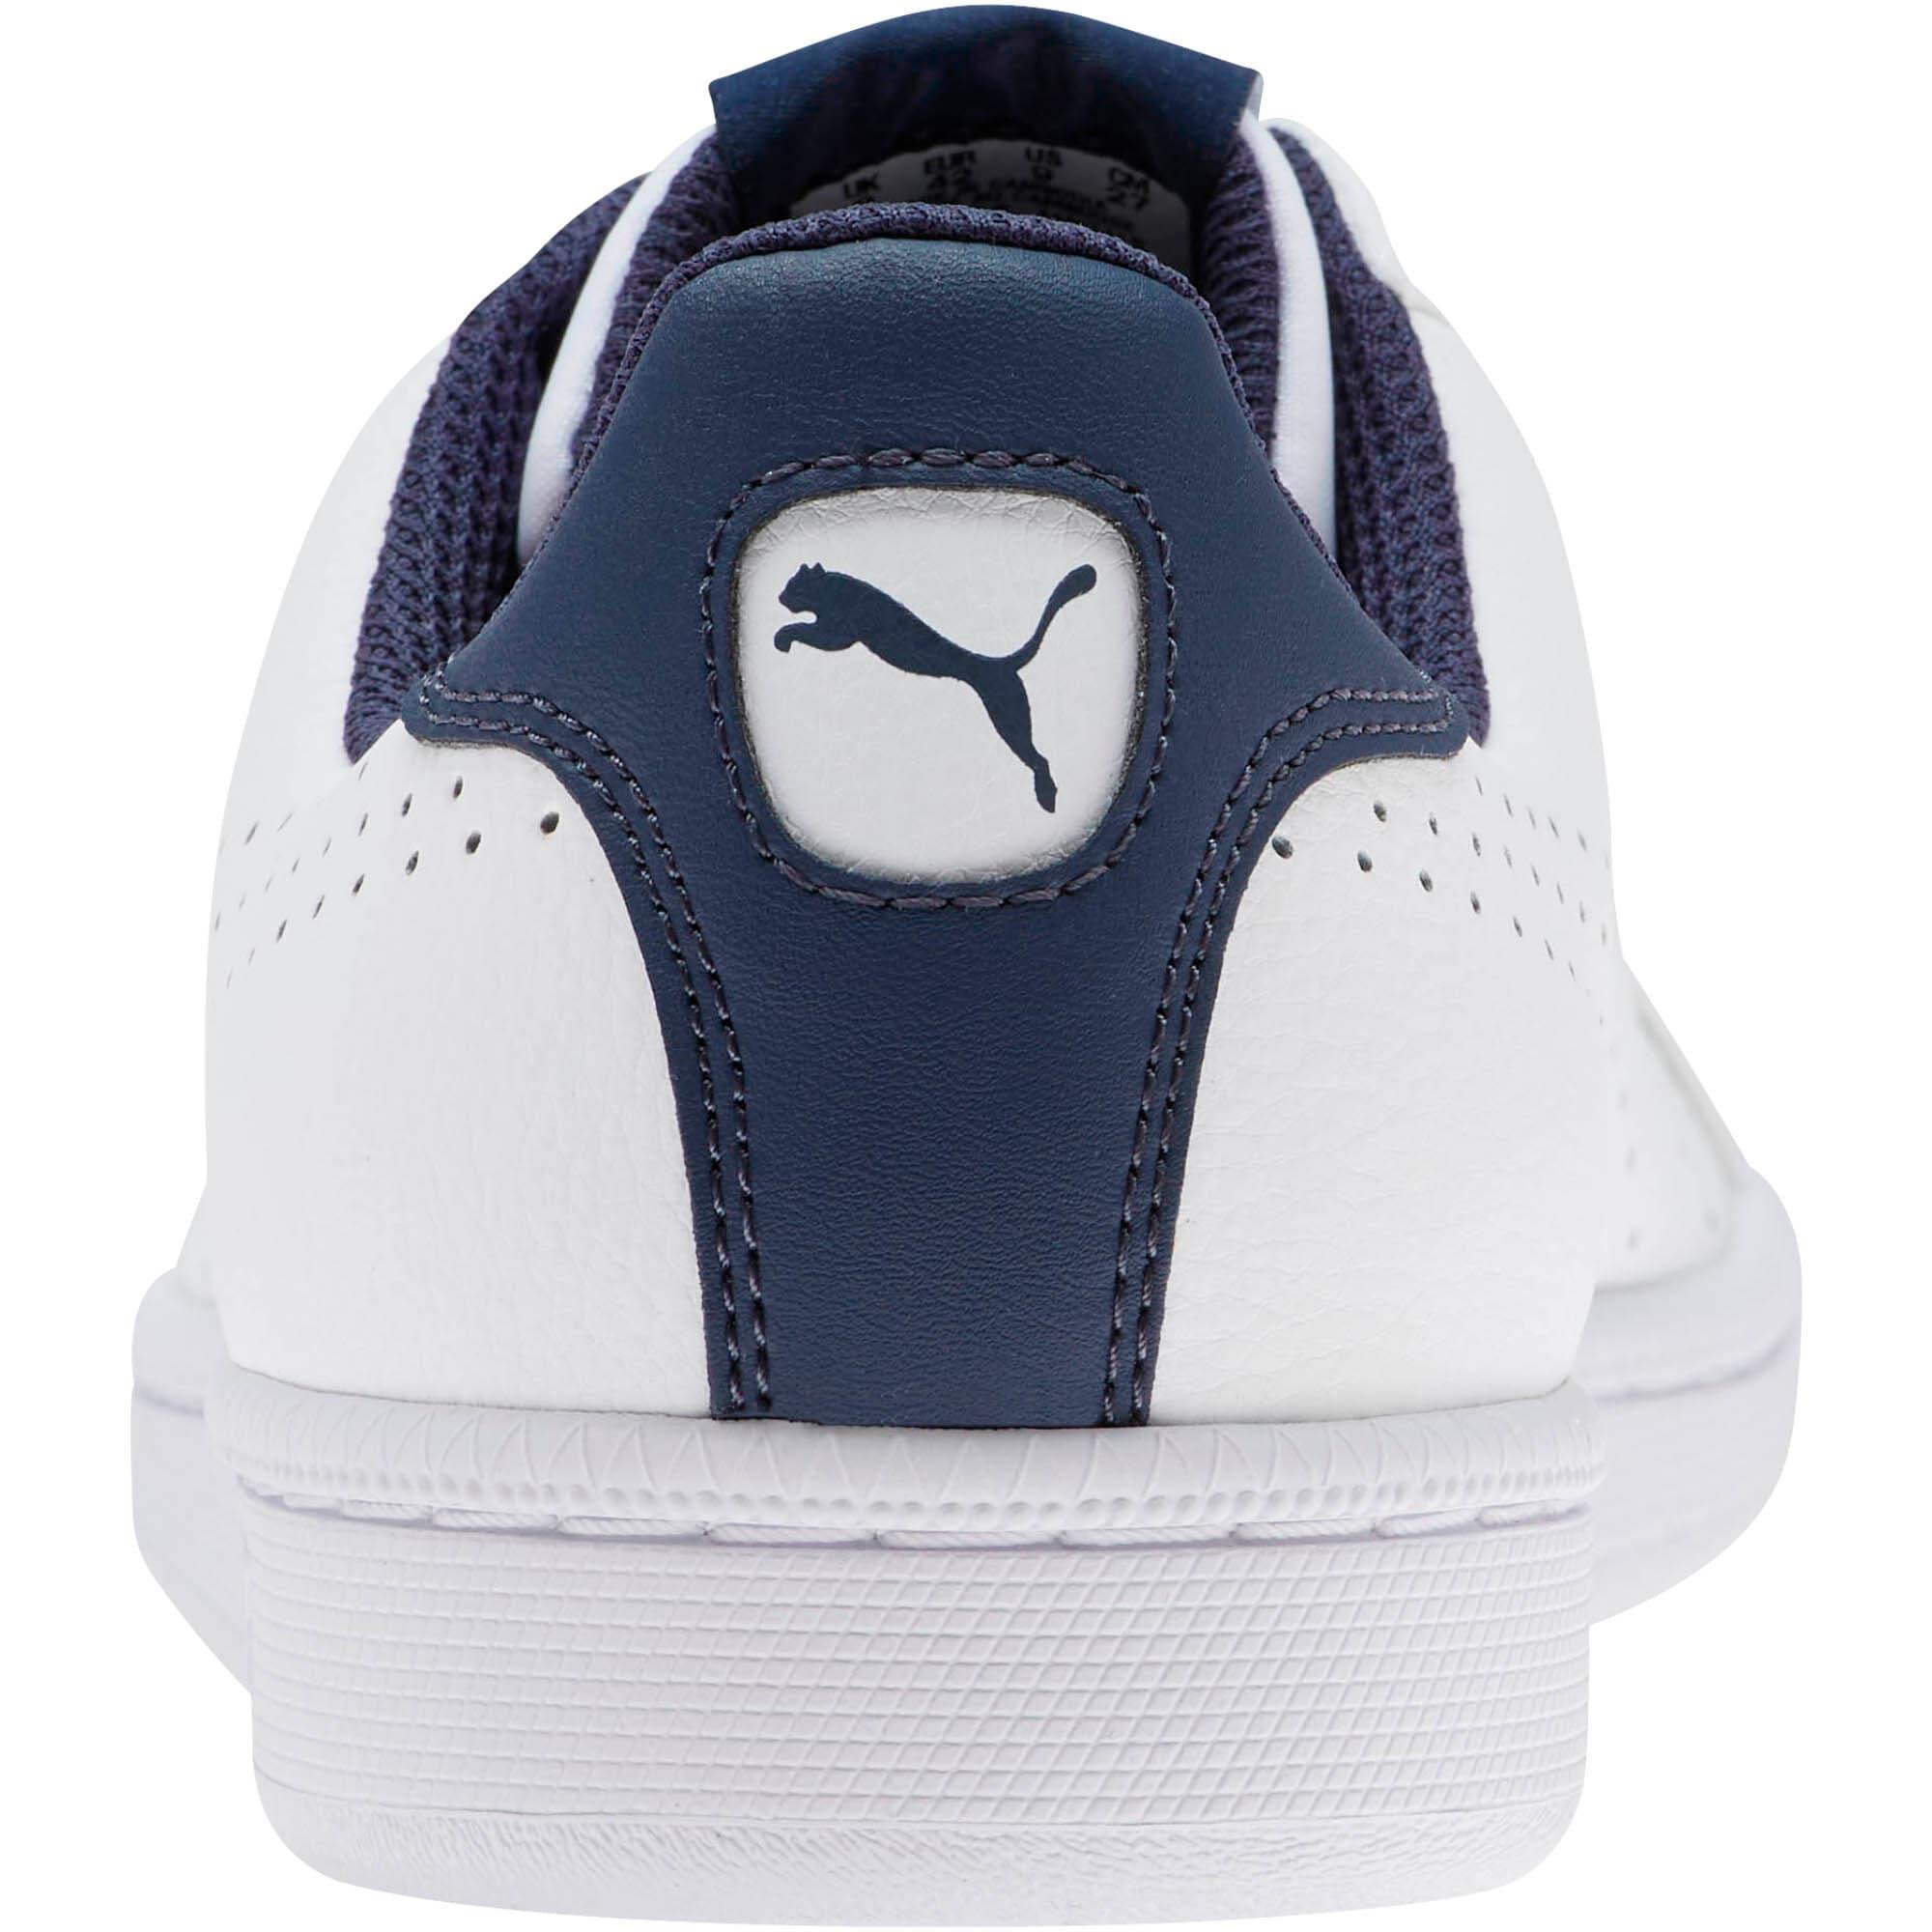 Thumbnail 3 of PUMA Smash Perf Sneakers, Puma White-Peacoat, medium